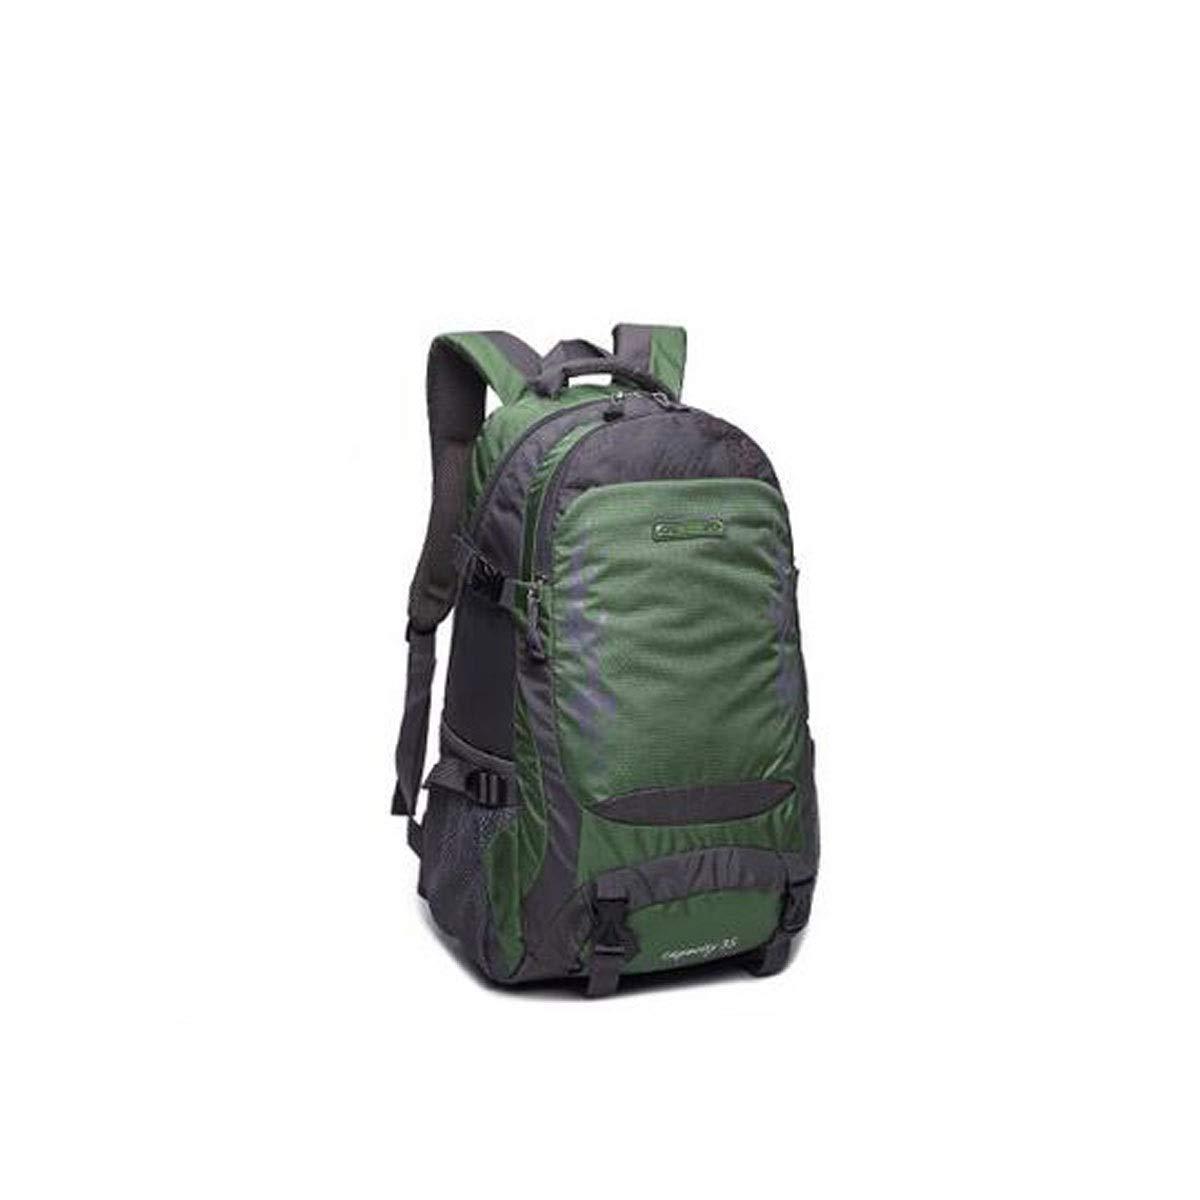 Color : ArmyGreen Purple ArmyGreen Rose Red) Blue Chenjinxiang01 Large-Capacity Backpack Leisure Travel Light Waterproof Outdoor Mountaineering Bag 30L(Black Orange